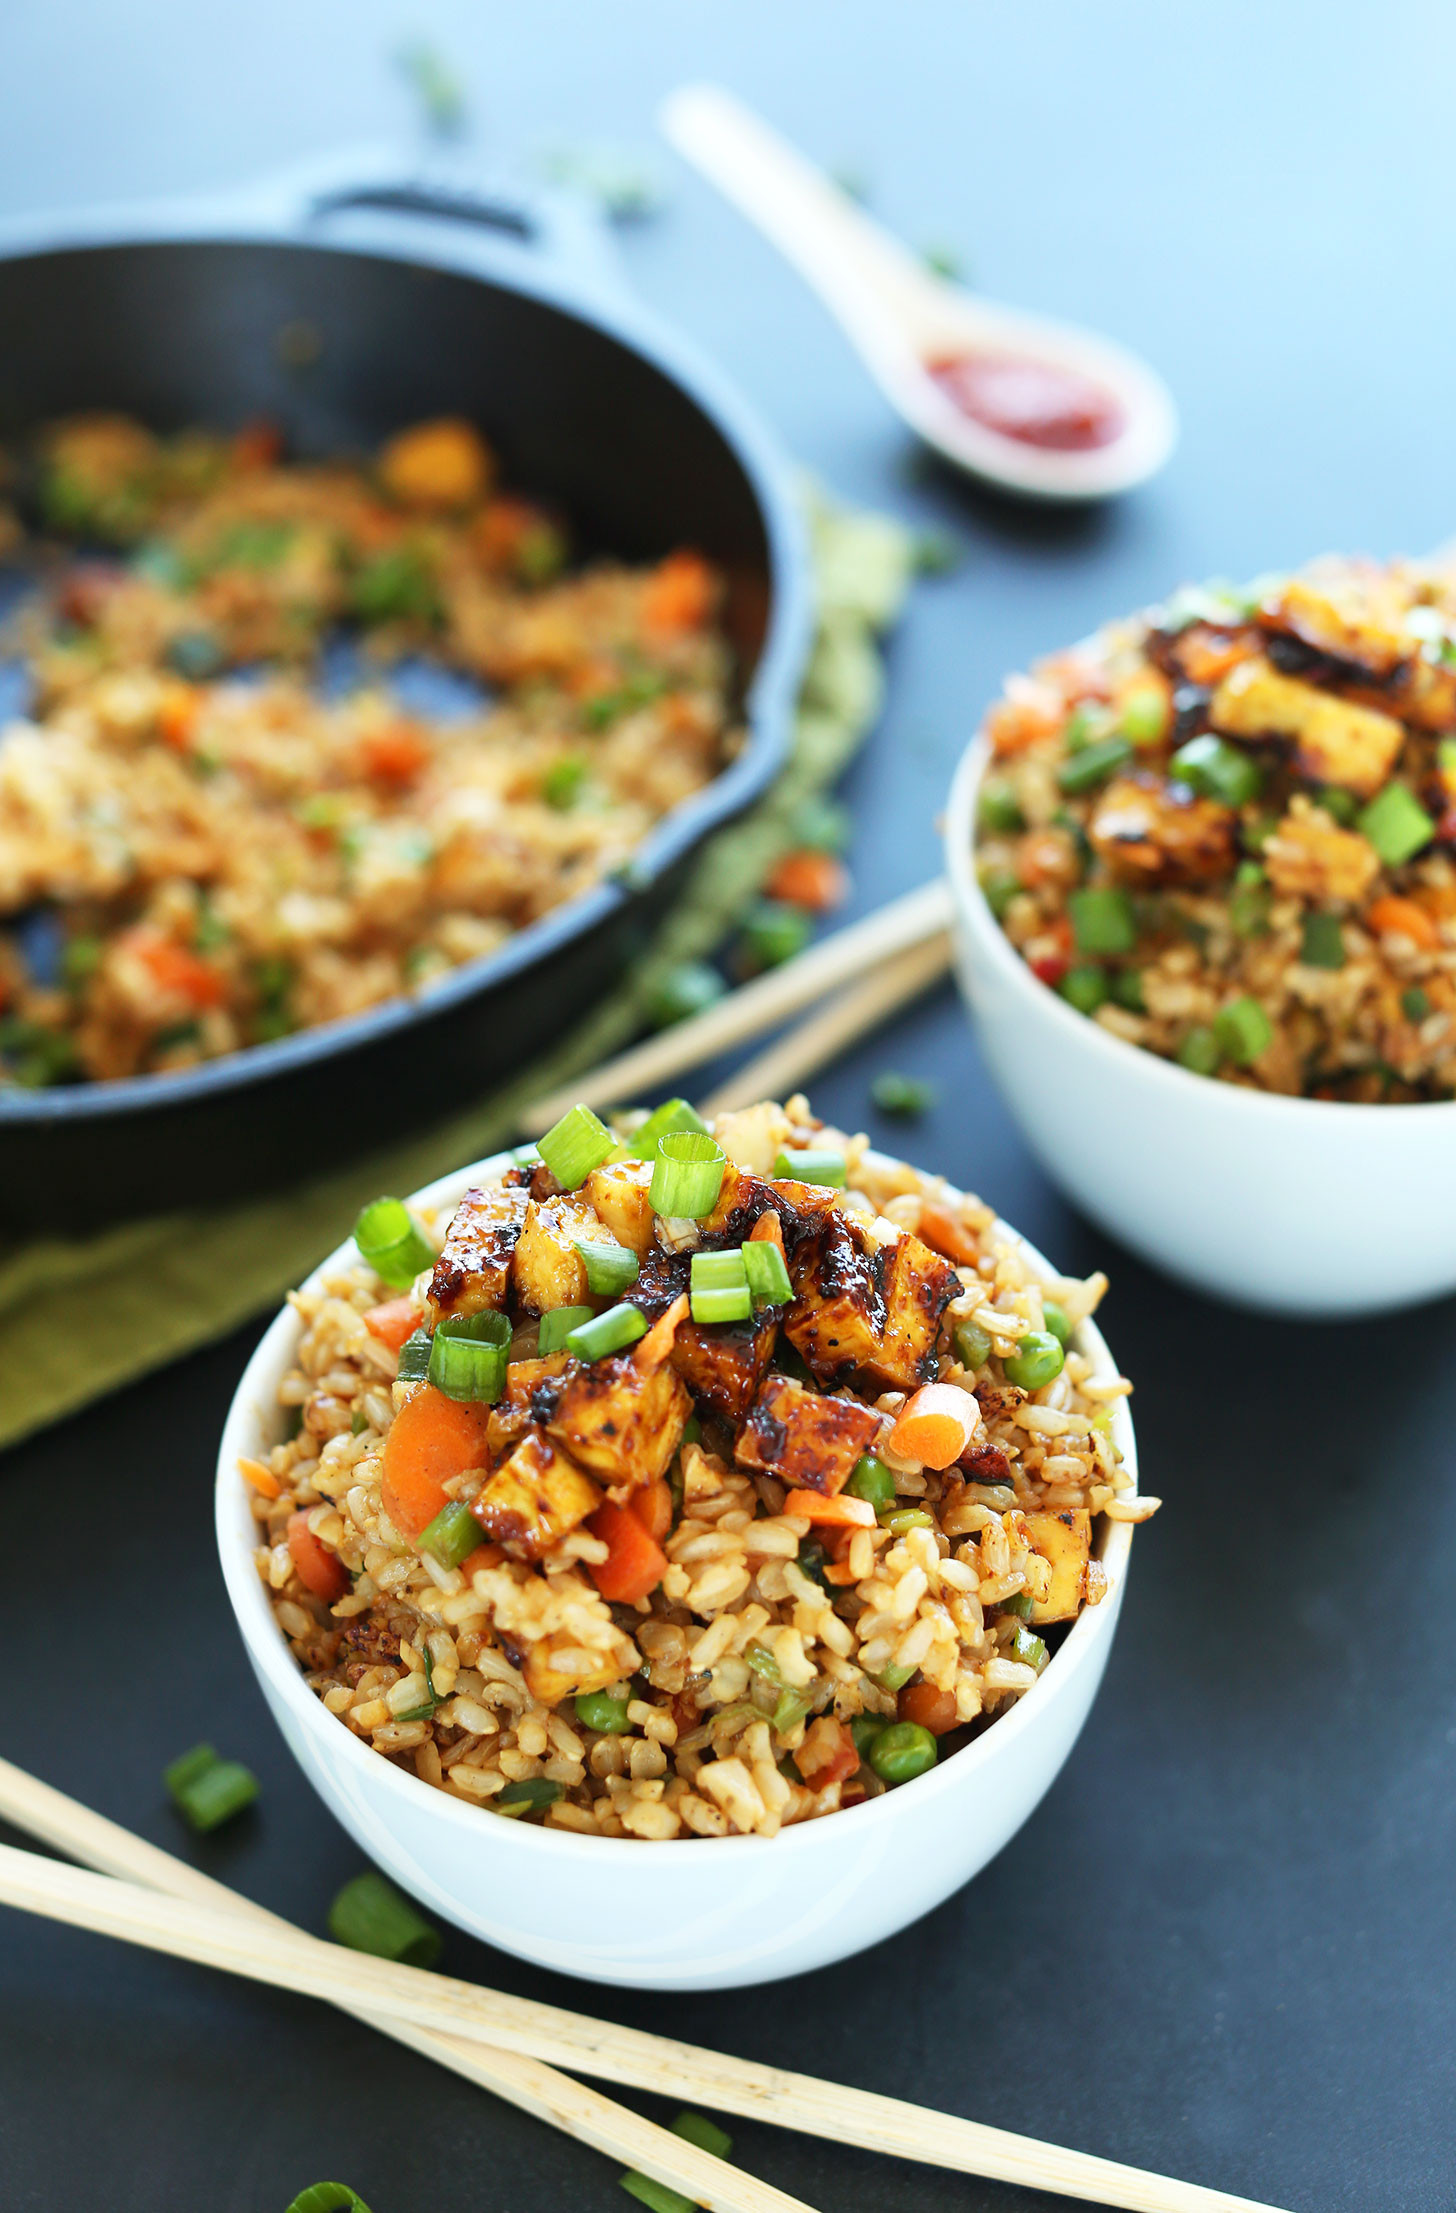 Easy Healthy Vegan Dinner Recipes  Vegan Fried Rice